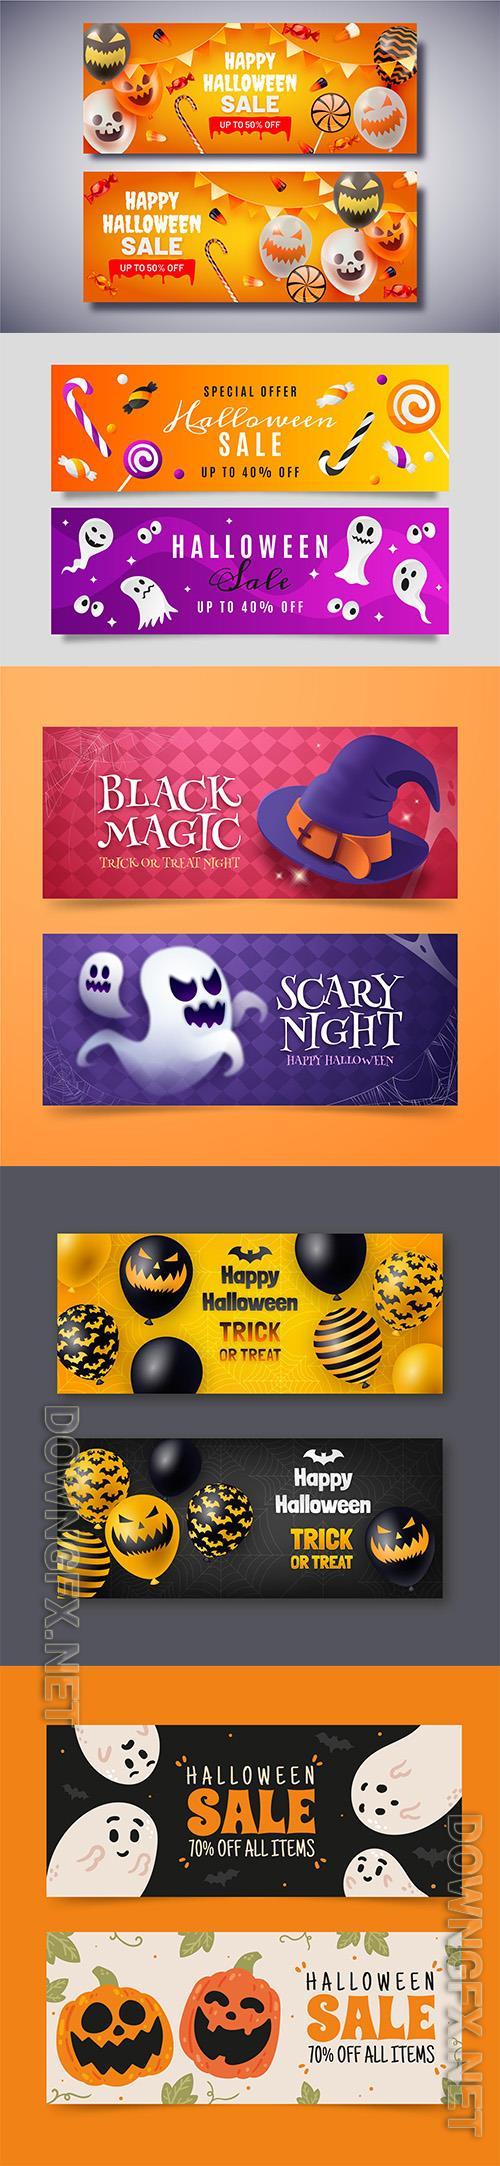 Halloween horizontal banners set